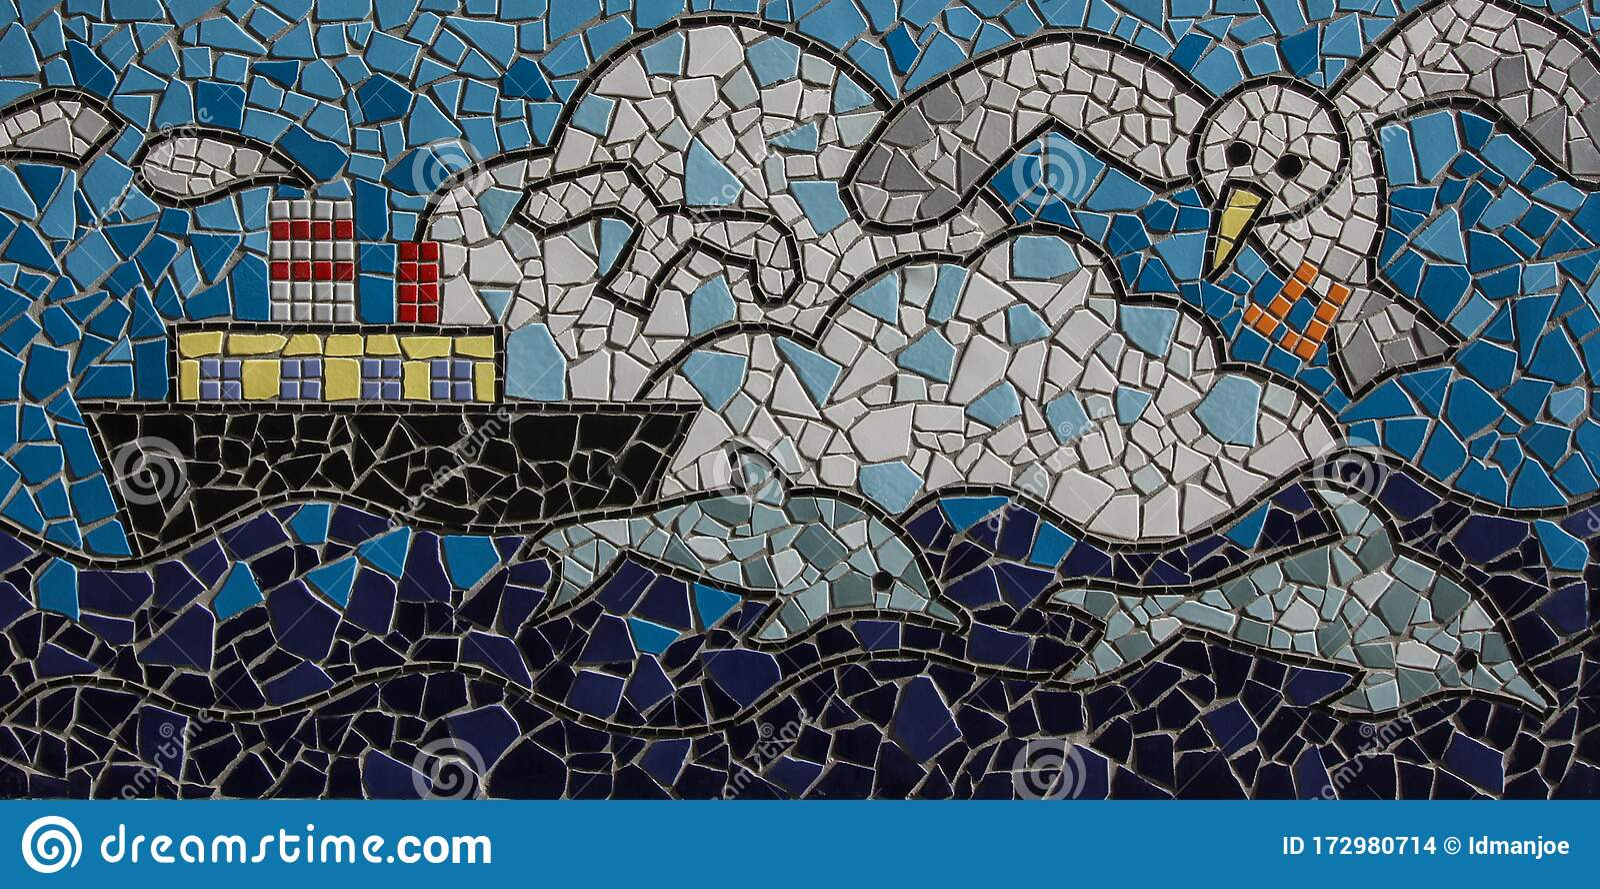 https www dreamstime com art mosaic tile kobe japan november port one japanese maritime backgrounded hanshin industrial region image172980714